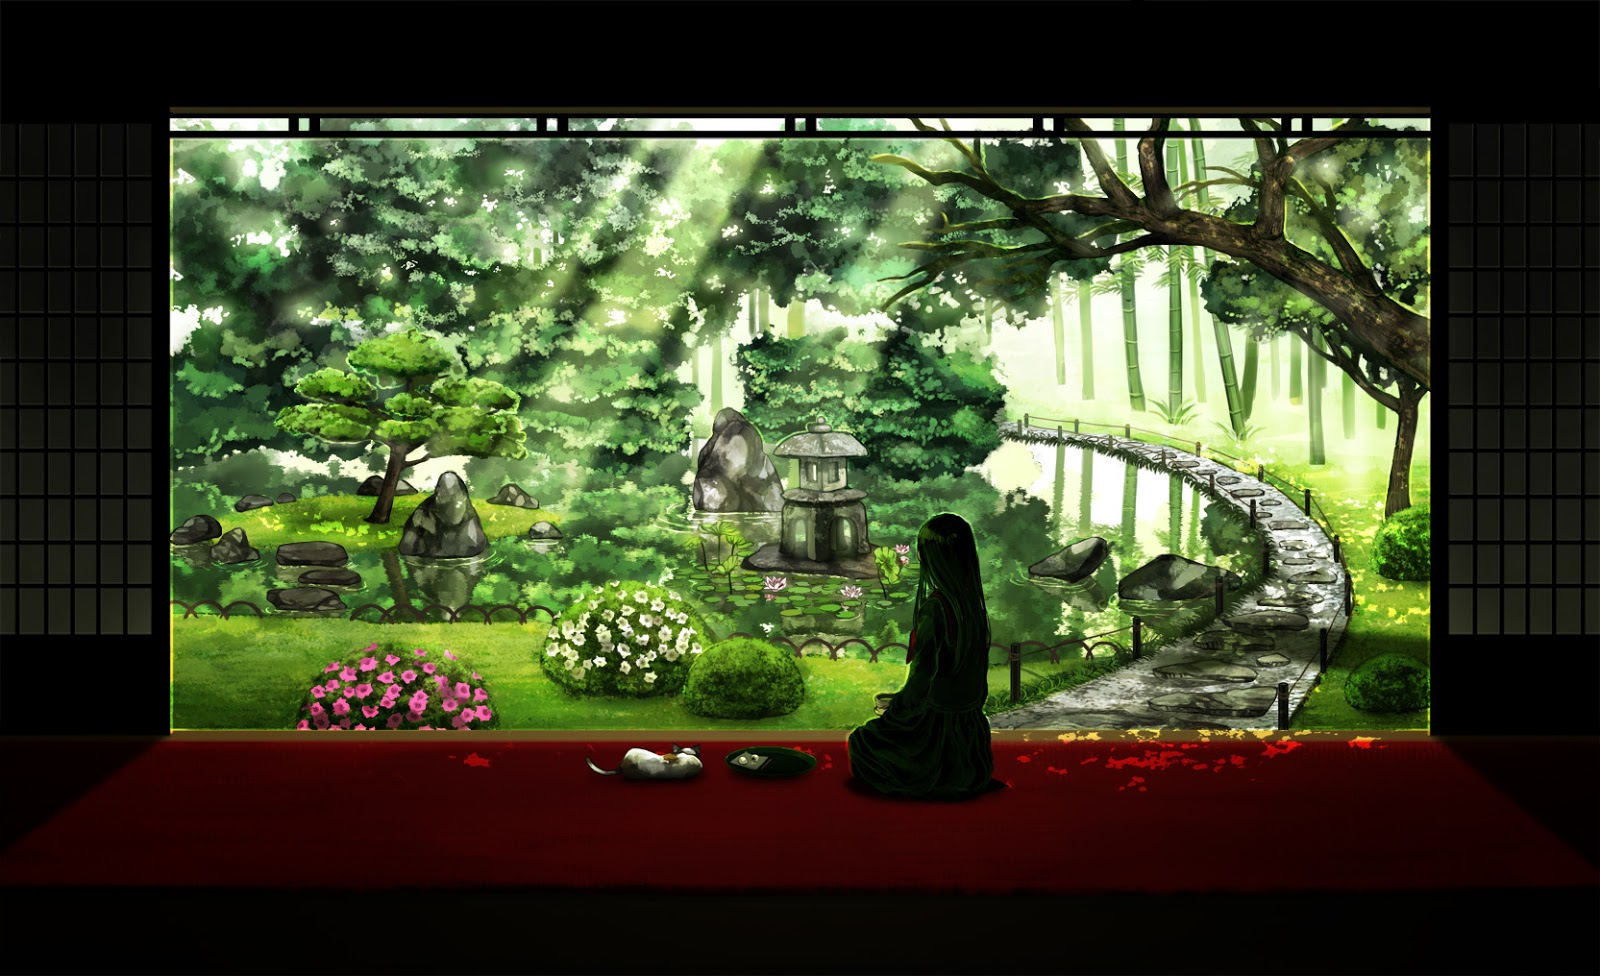 Anime Scenery Backgrounds